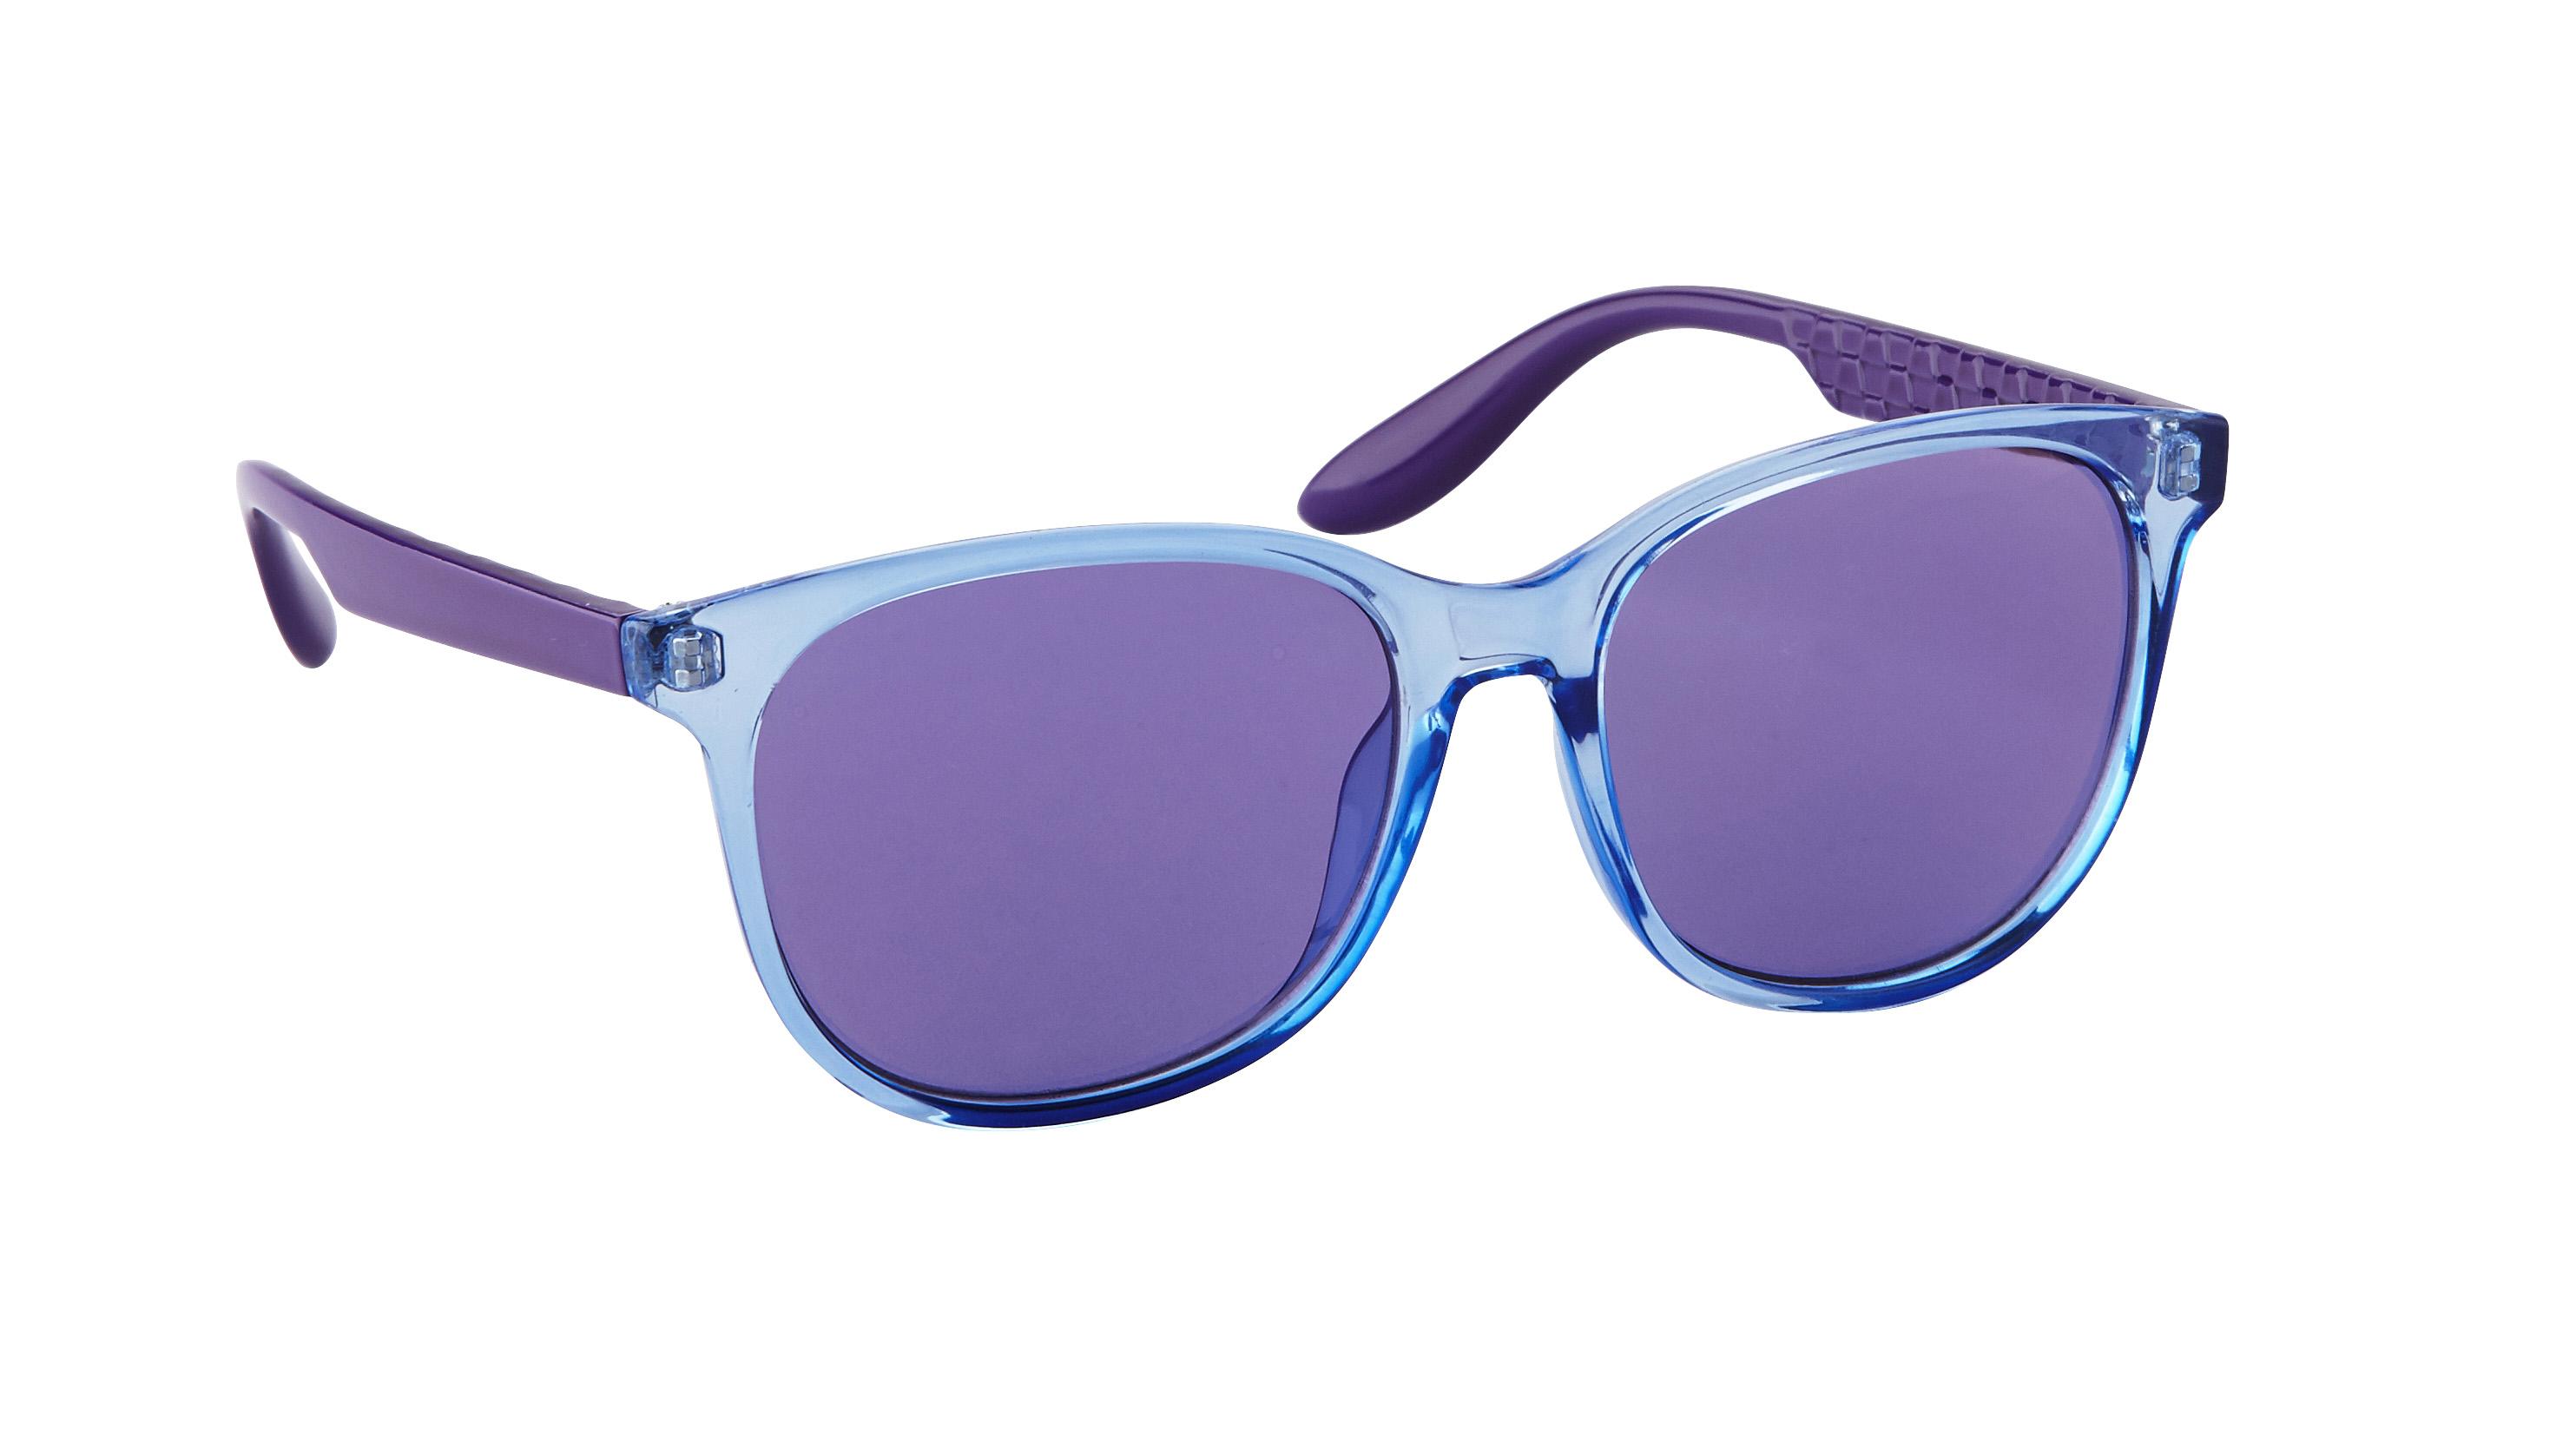 bluepoint – Bluepiont solbrille - 1650-00 størrelse 55 på brodersen + kobborg